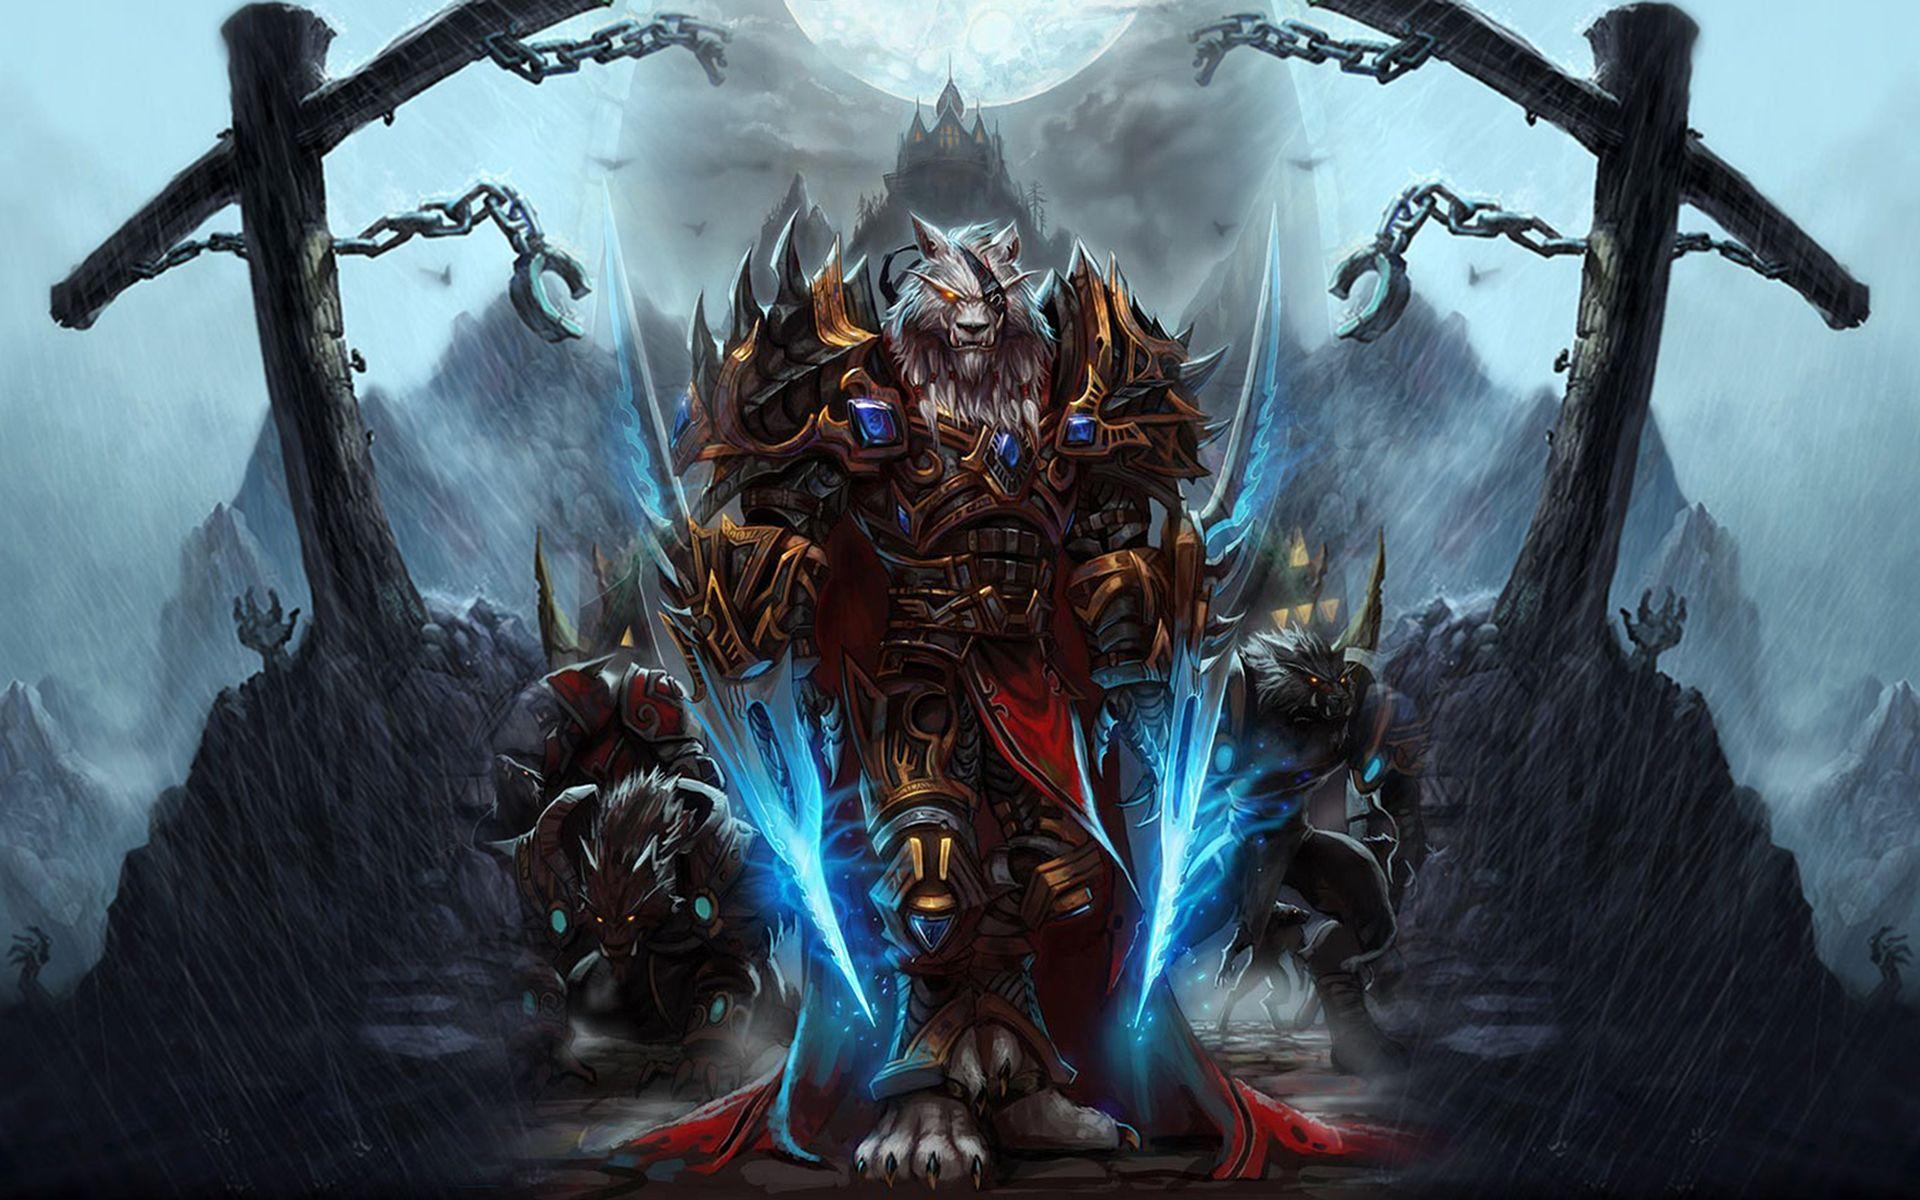 Igry Mir Varkaft World Of Warcraft Wow 21002 World Of Warcraft Wallpaper World Of Warcraft World Of Warcraft Cataclysm